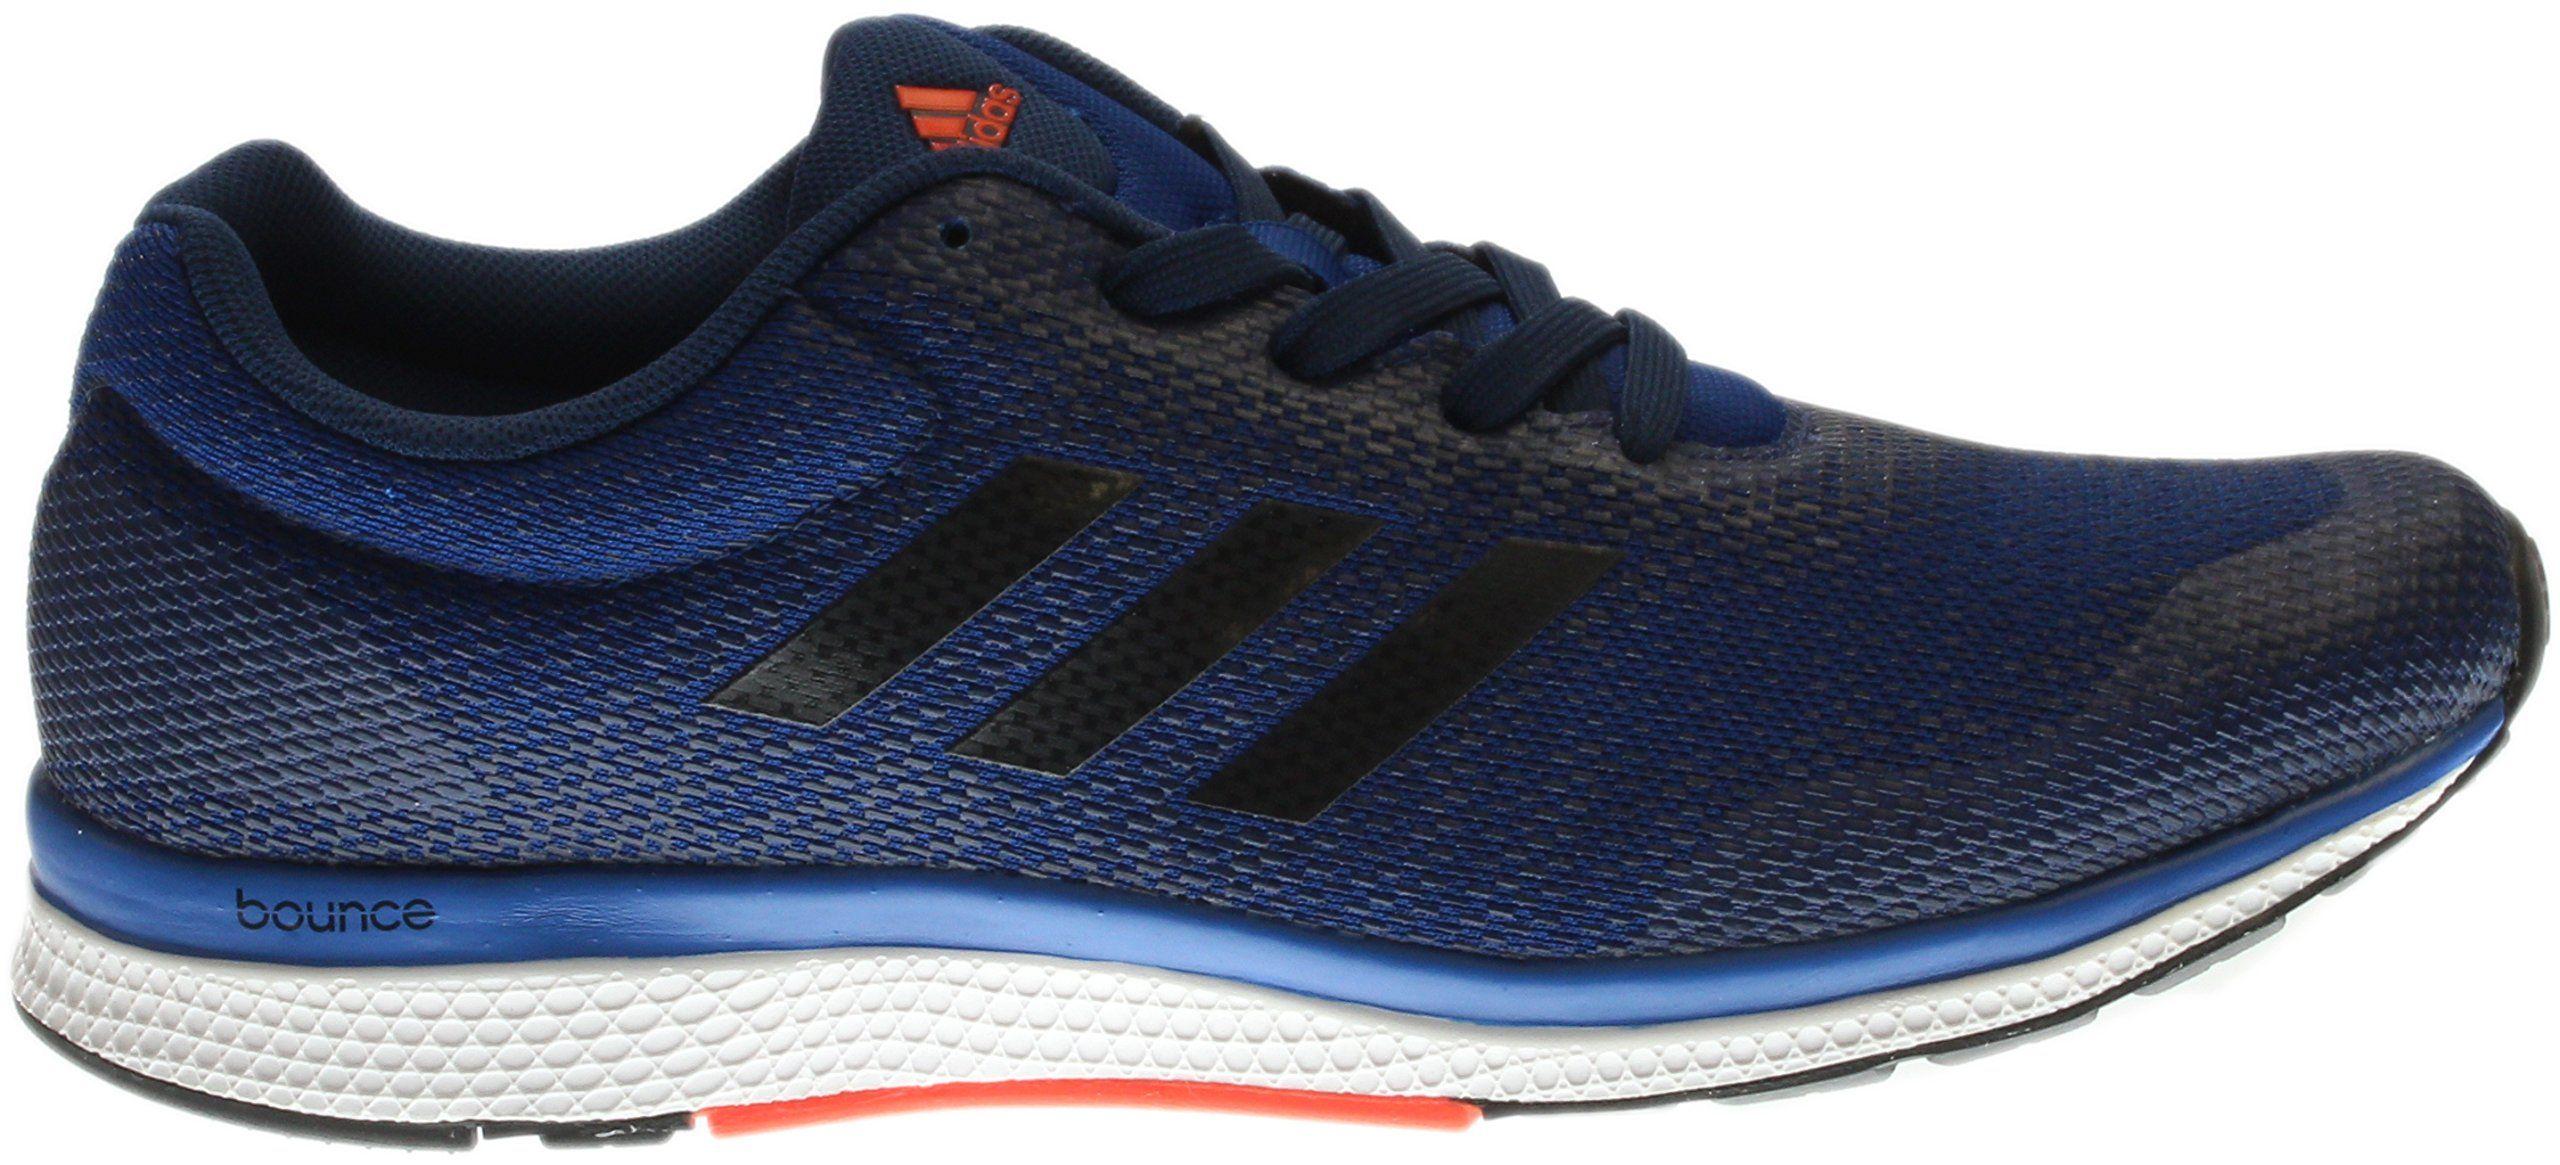 e72d168b7 adidas Performance Mens Mana Bounce 2 m Aramis Running Shoe Collegiate  Royal Black Energy